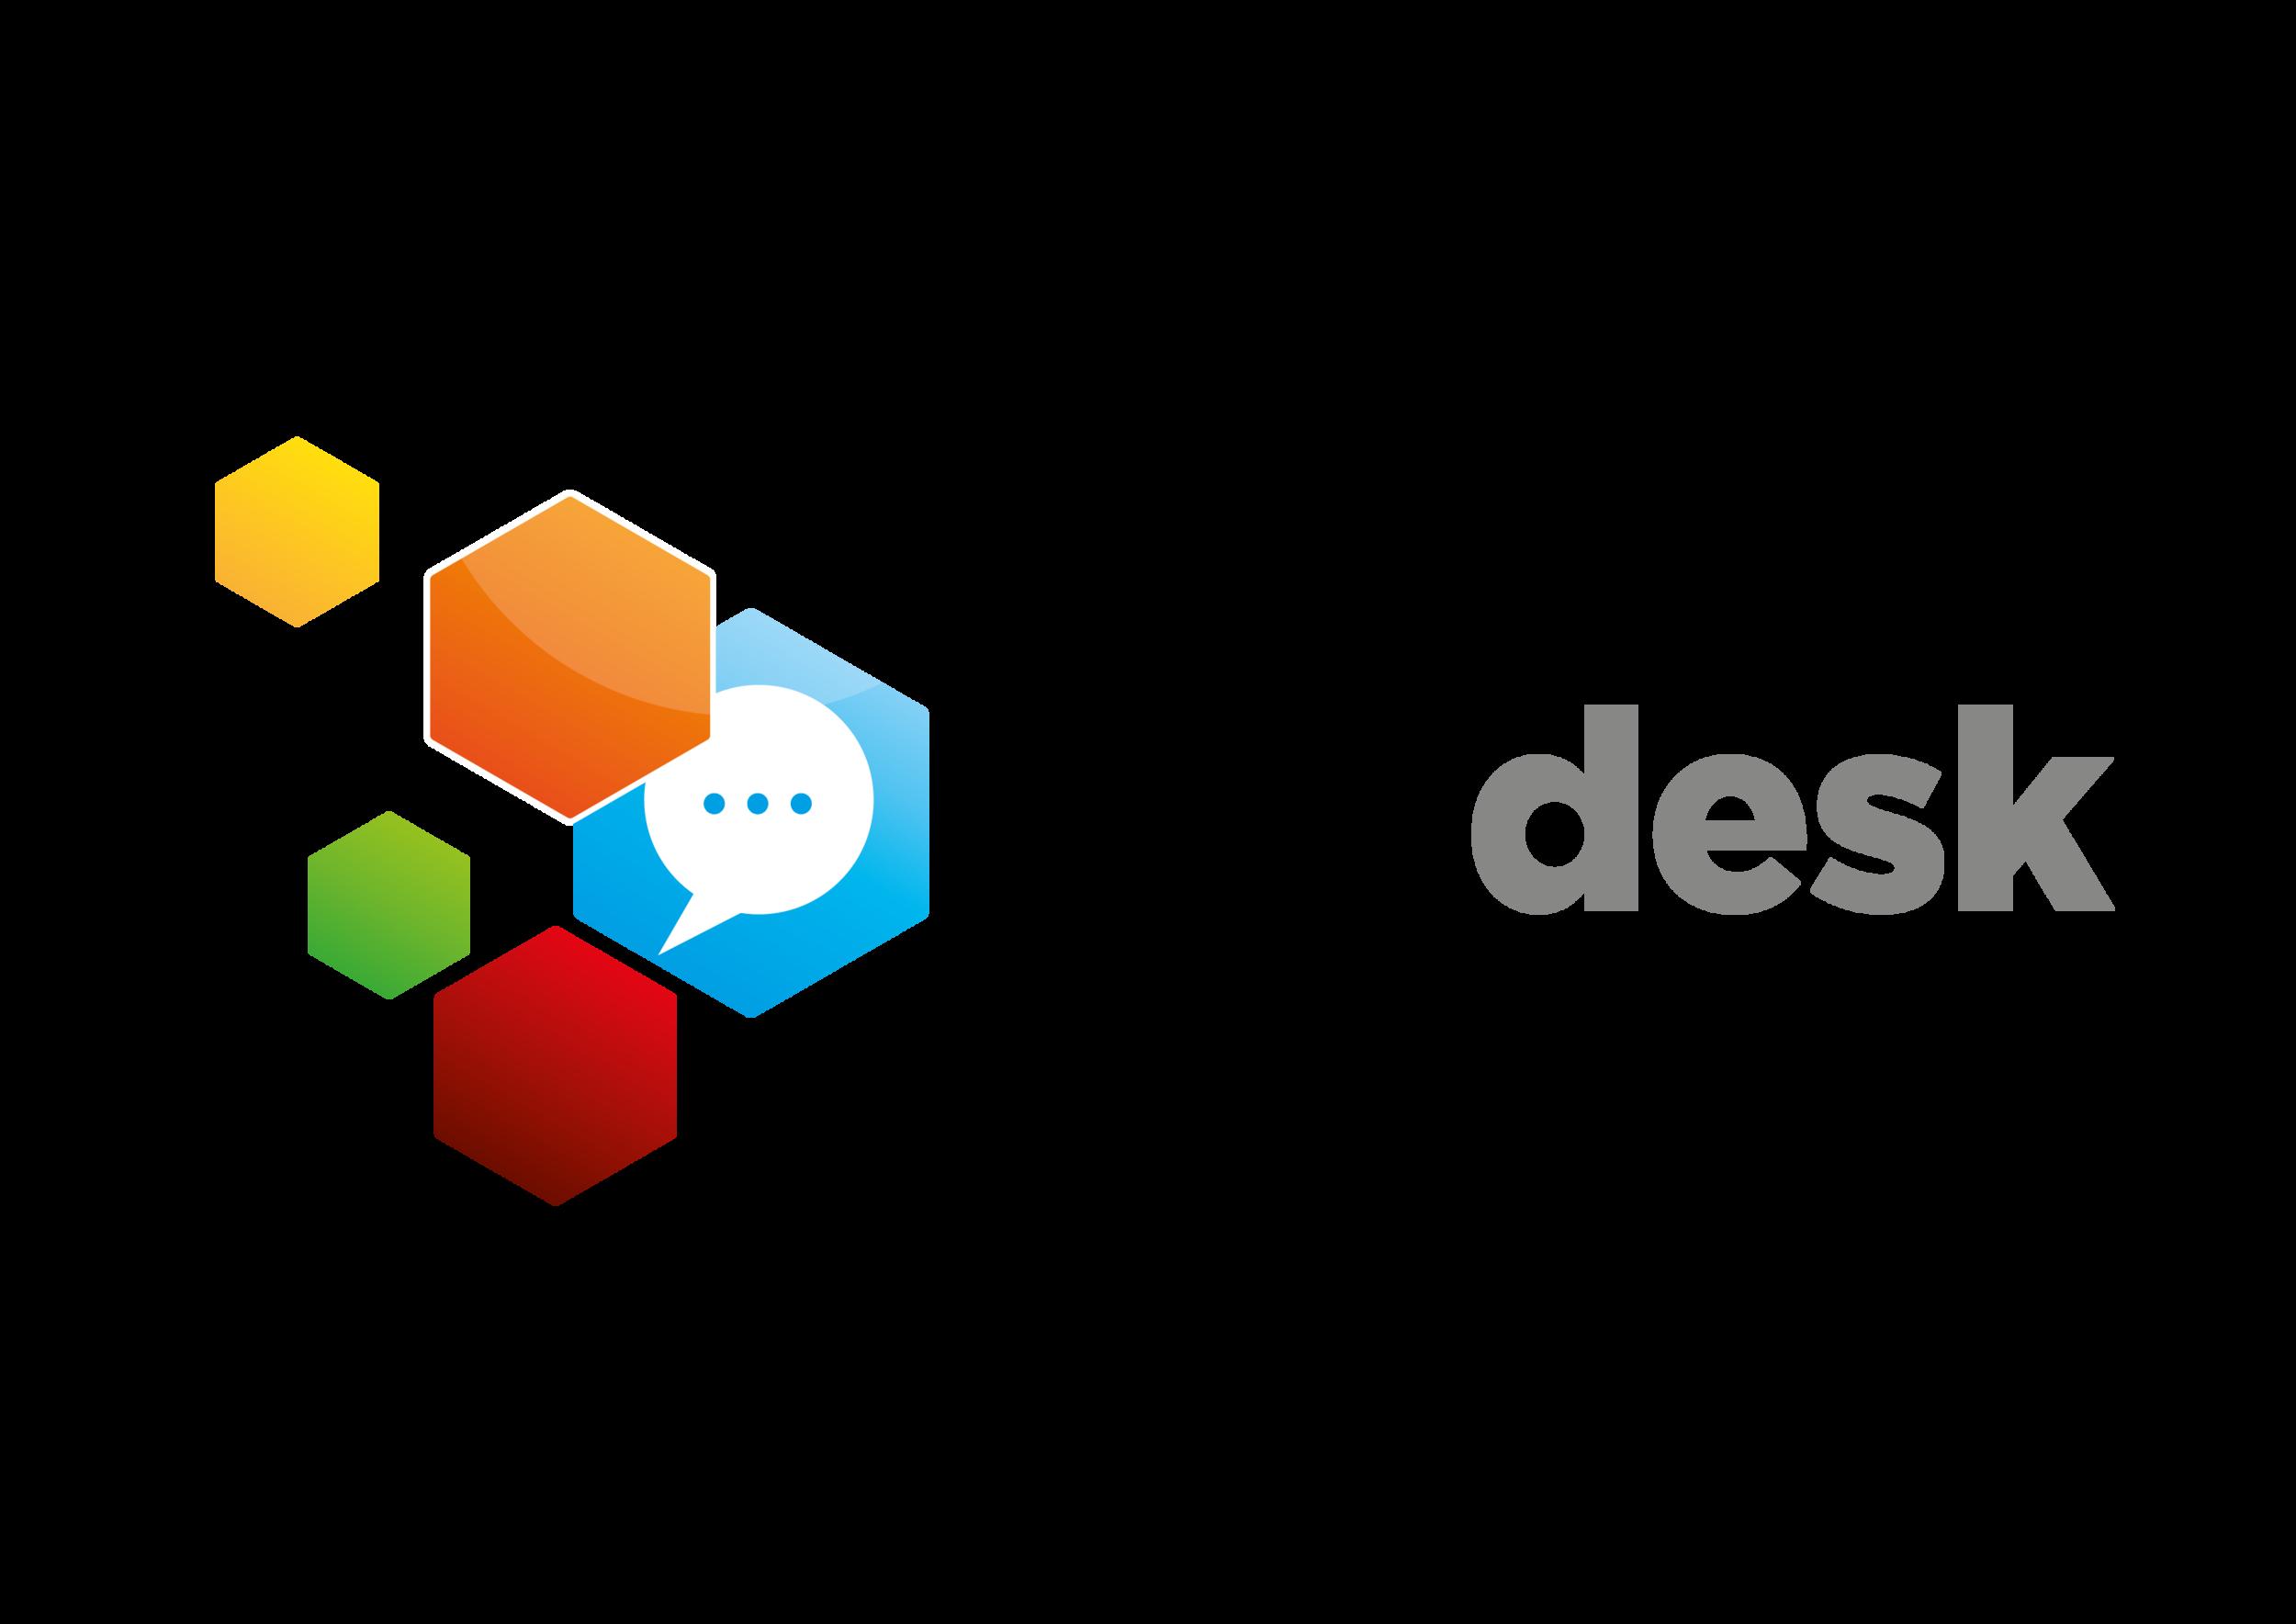 richdesk logo